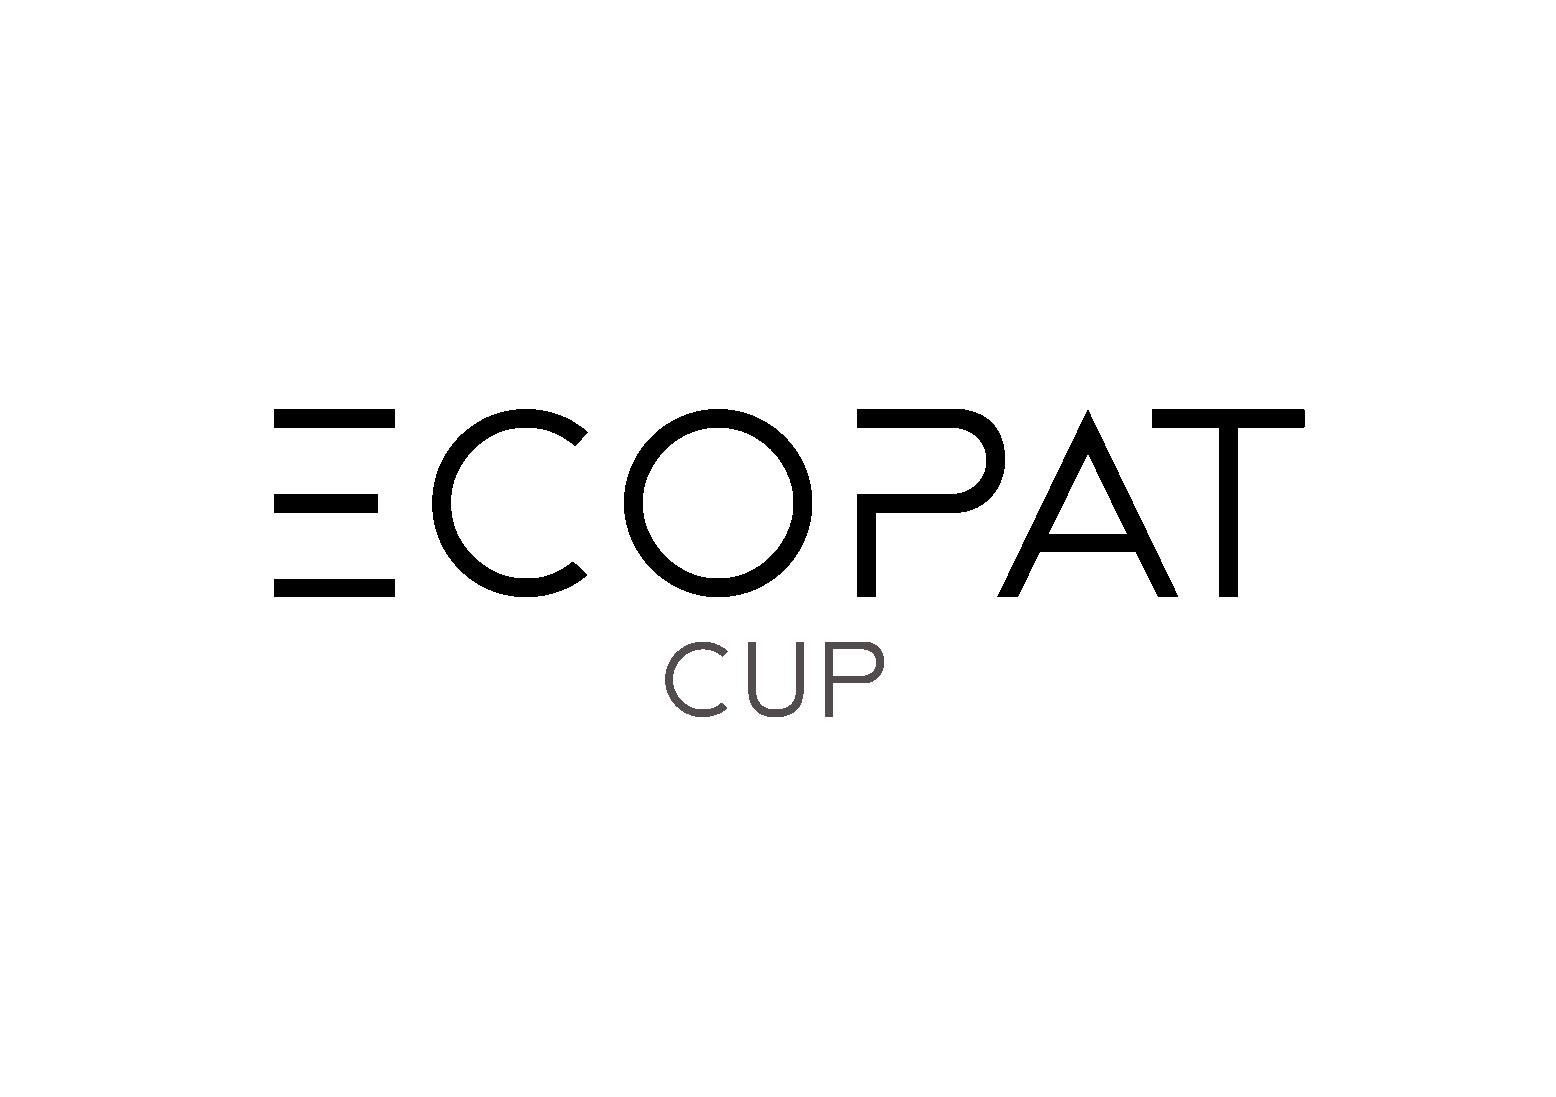 Ecopat